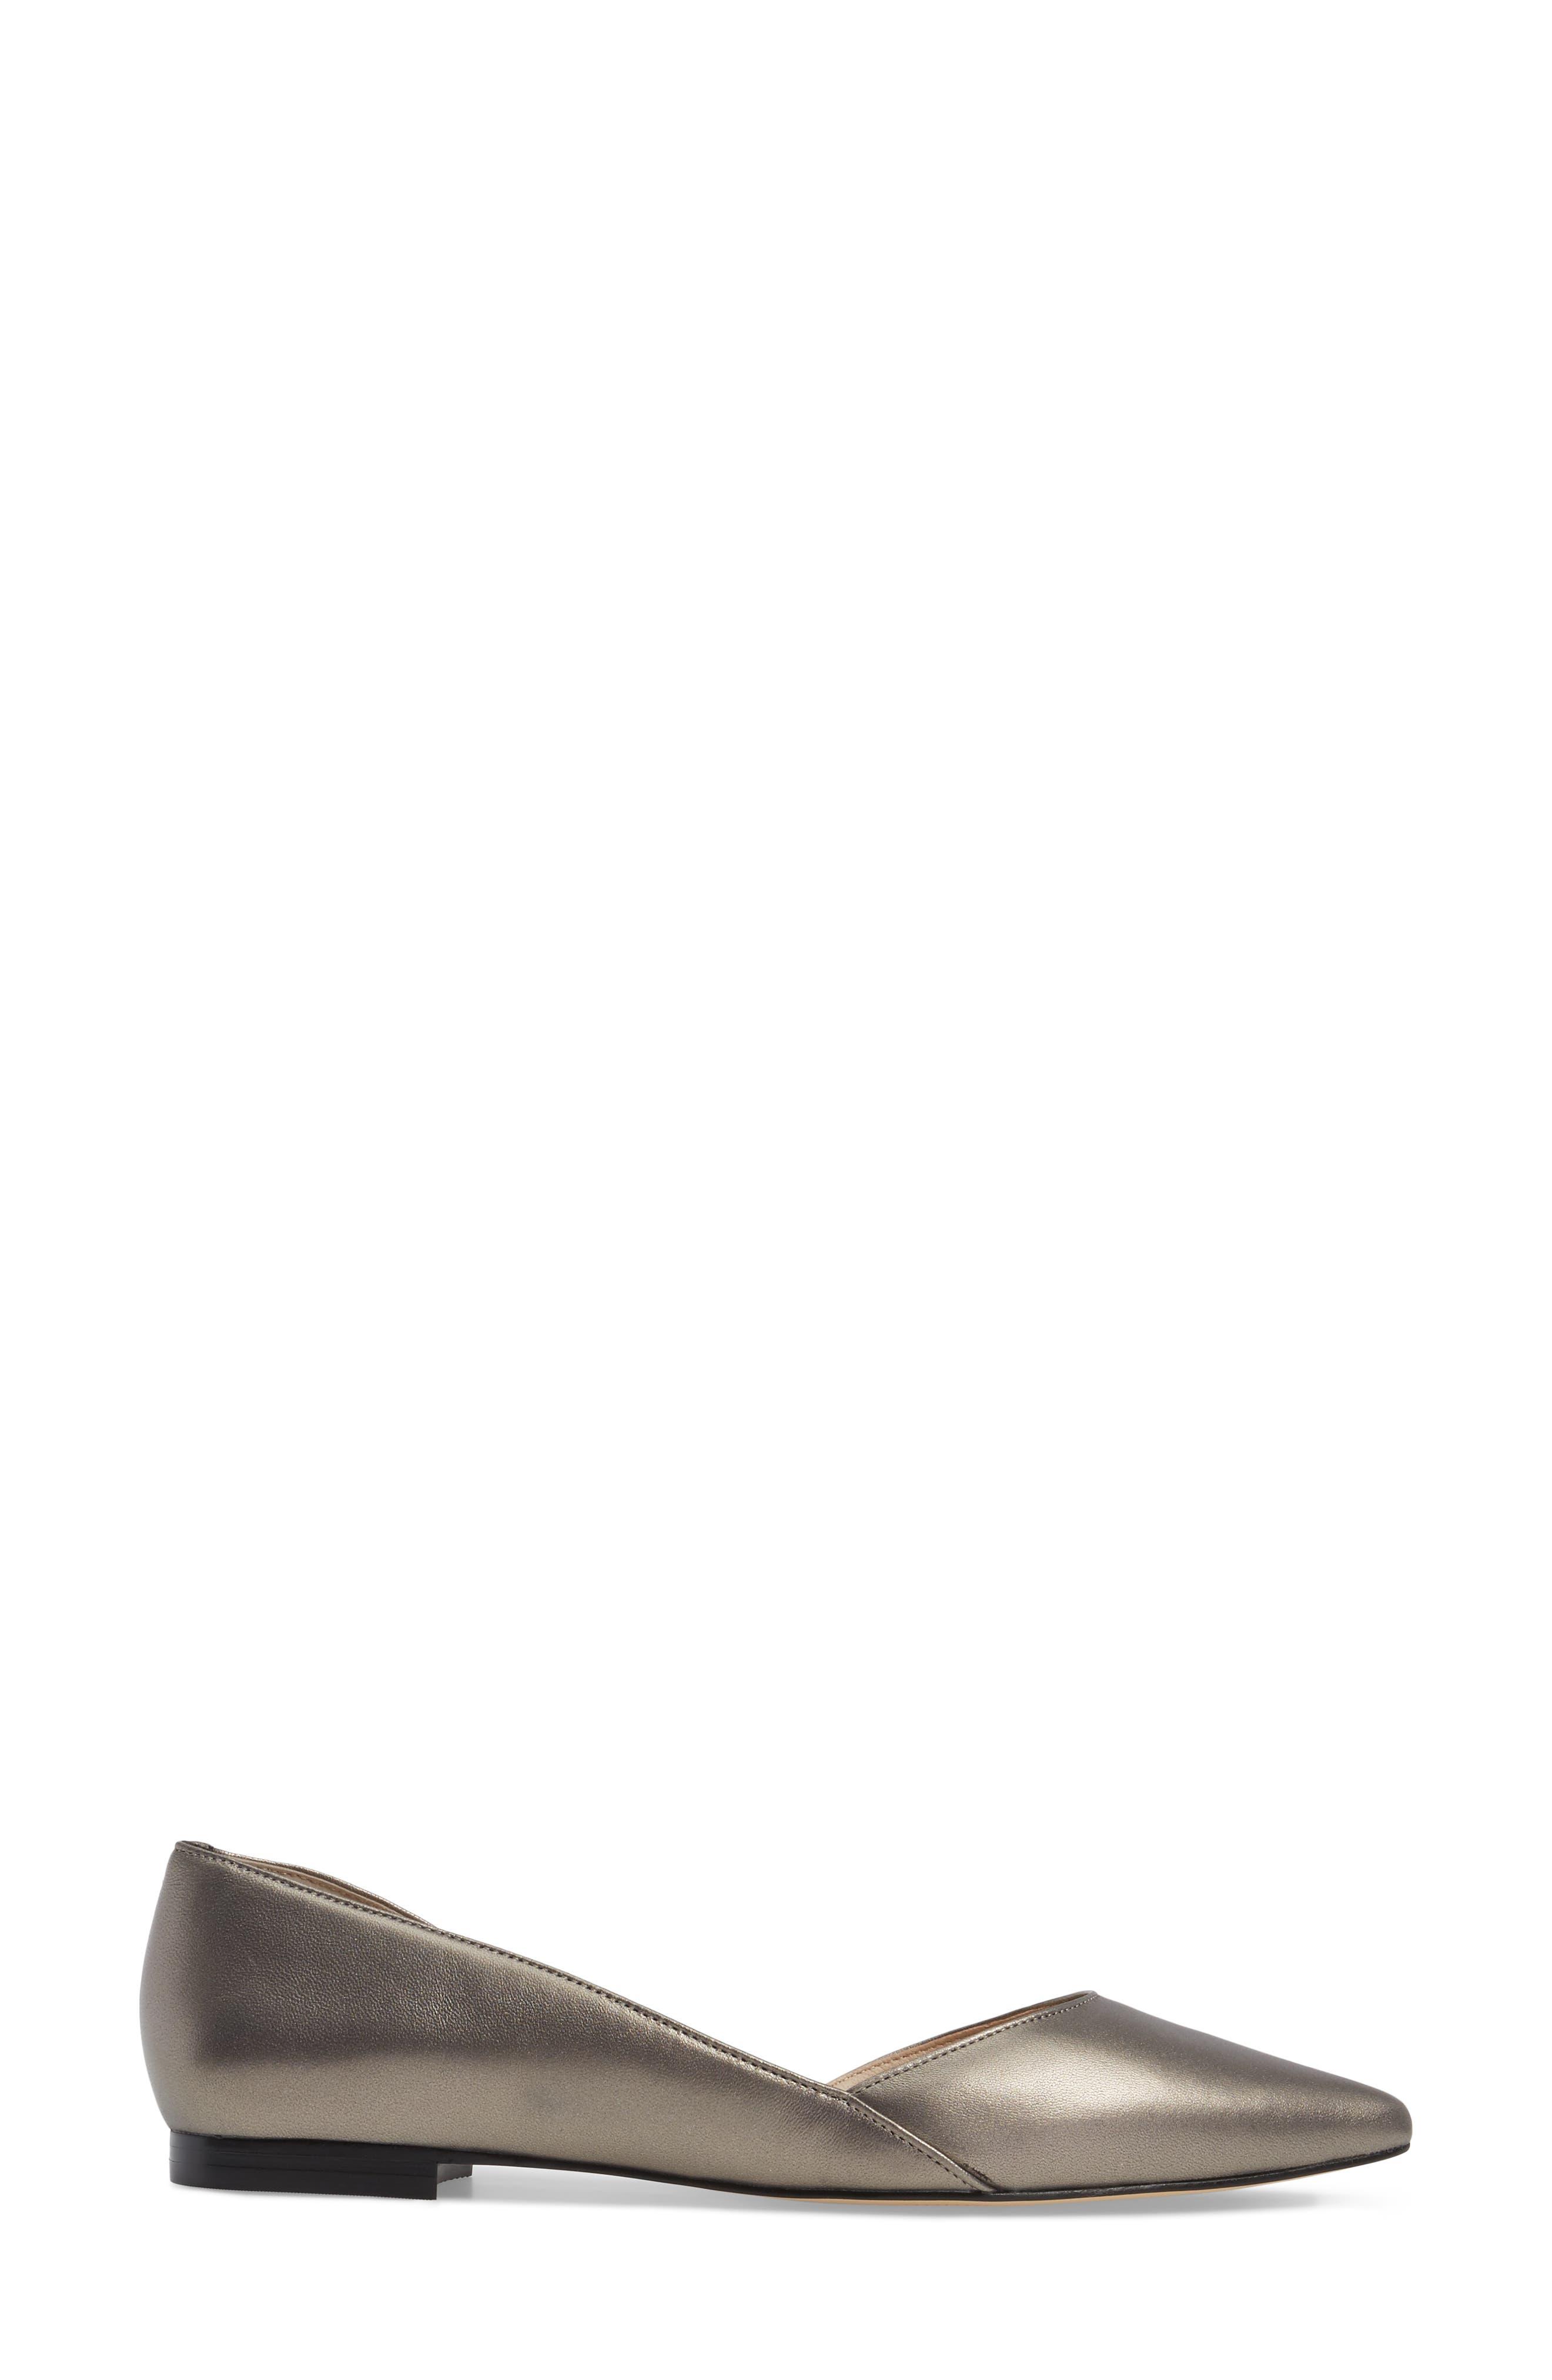 'Sunny' Half d'Orsay Flat,                             Alternate thumbnail 125, color,